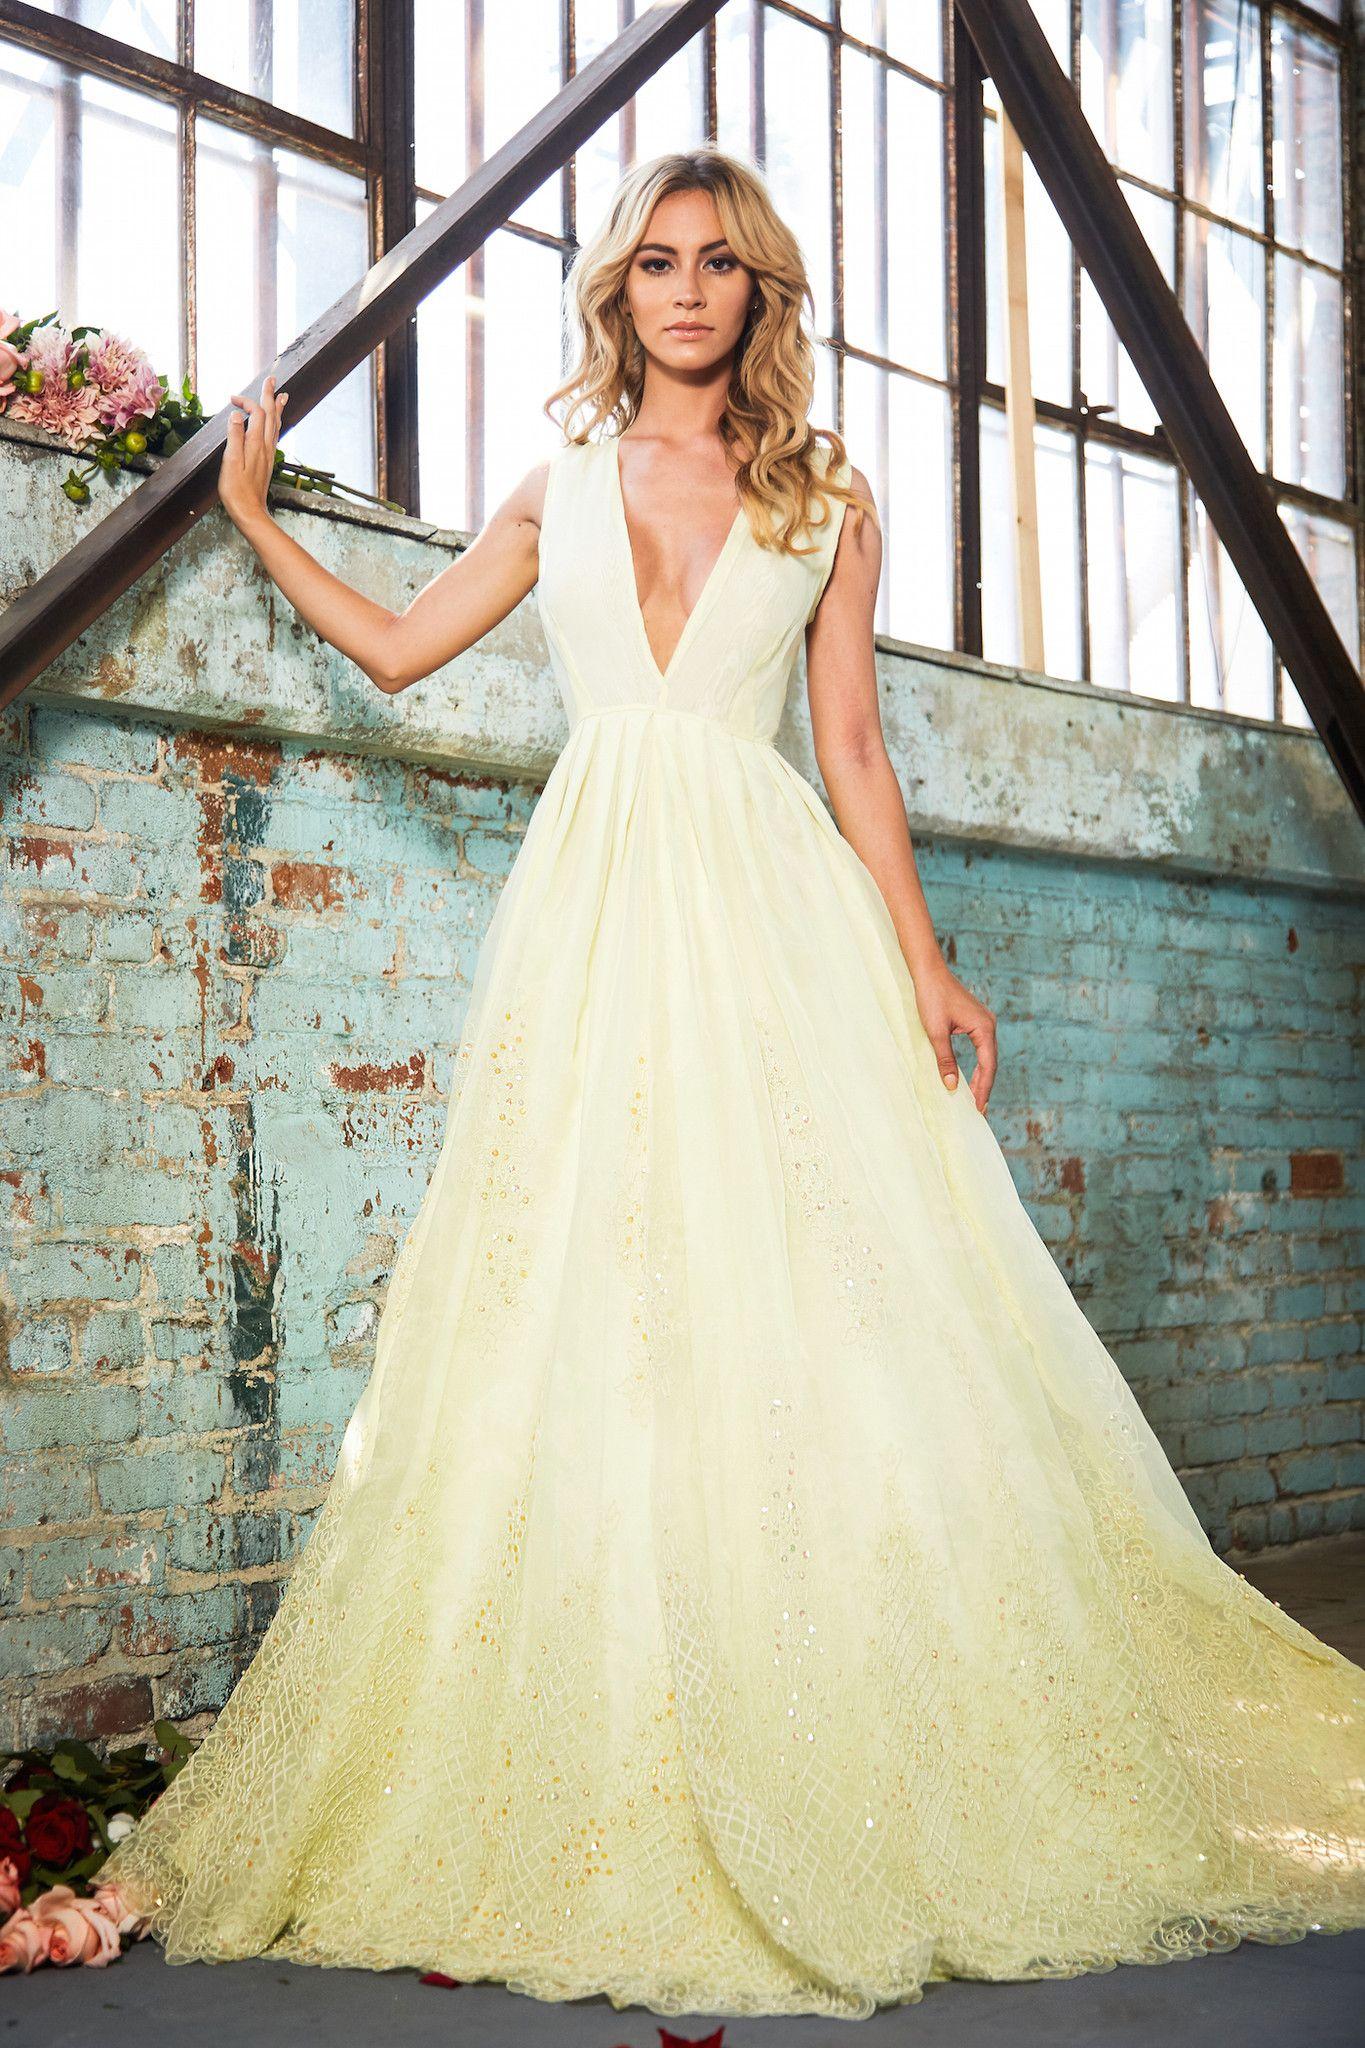 Lurelly Bridal High Fashion Wedding Dresses Inspiration ...